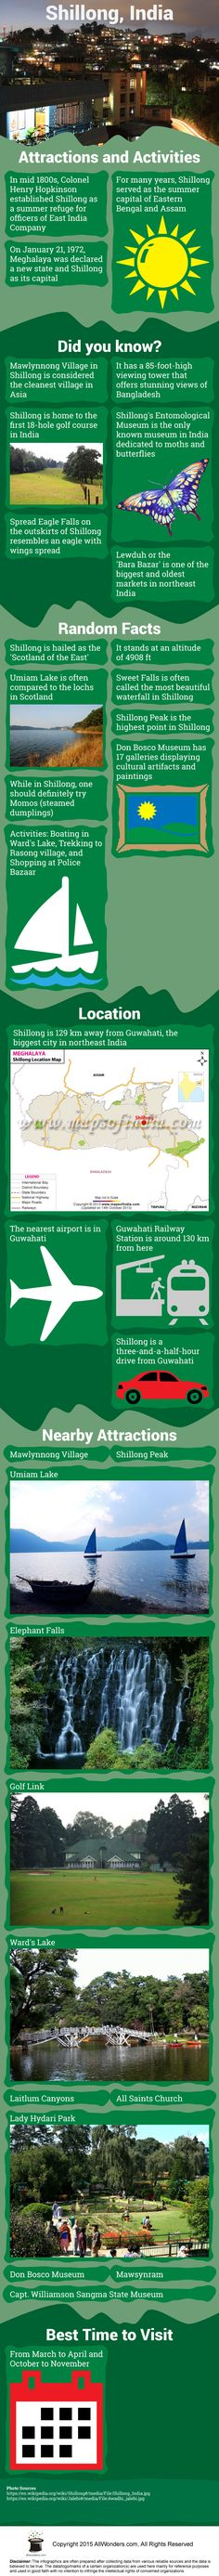 Shillong Travel Infographic